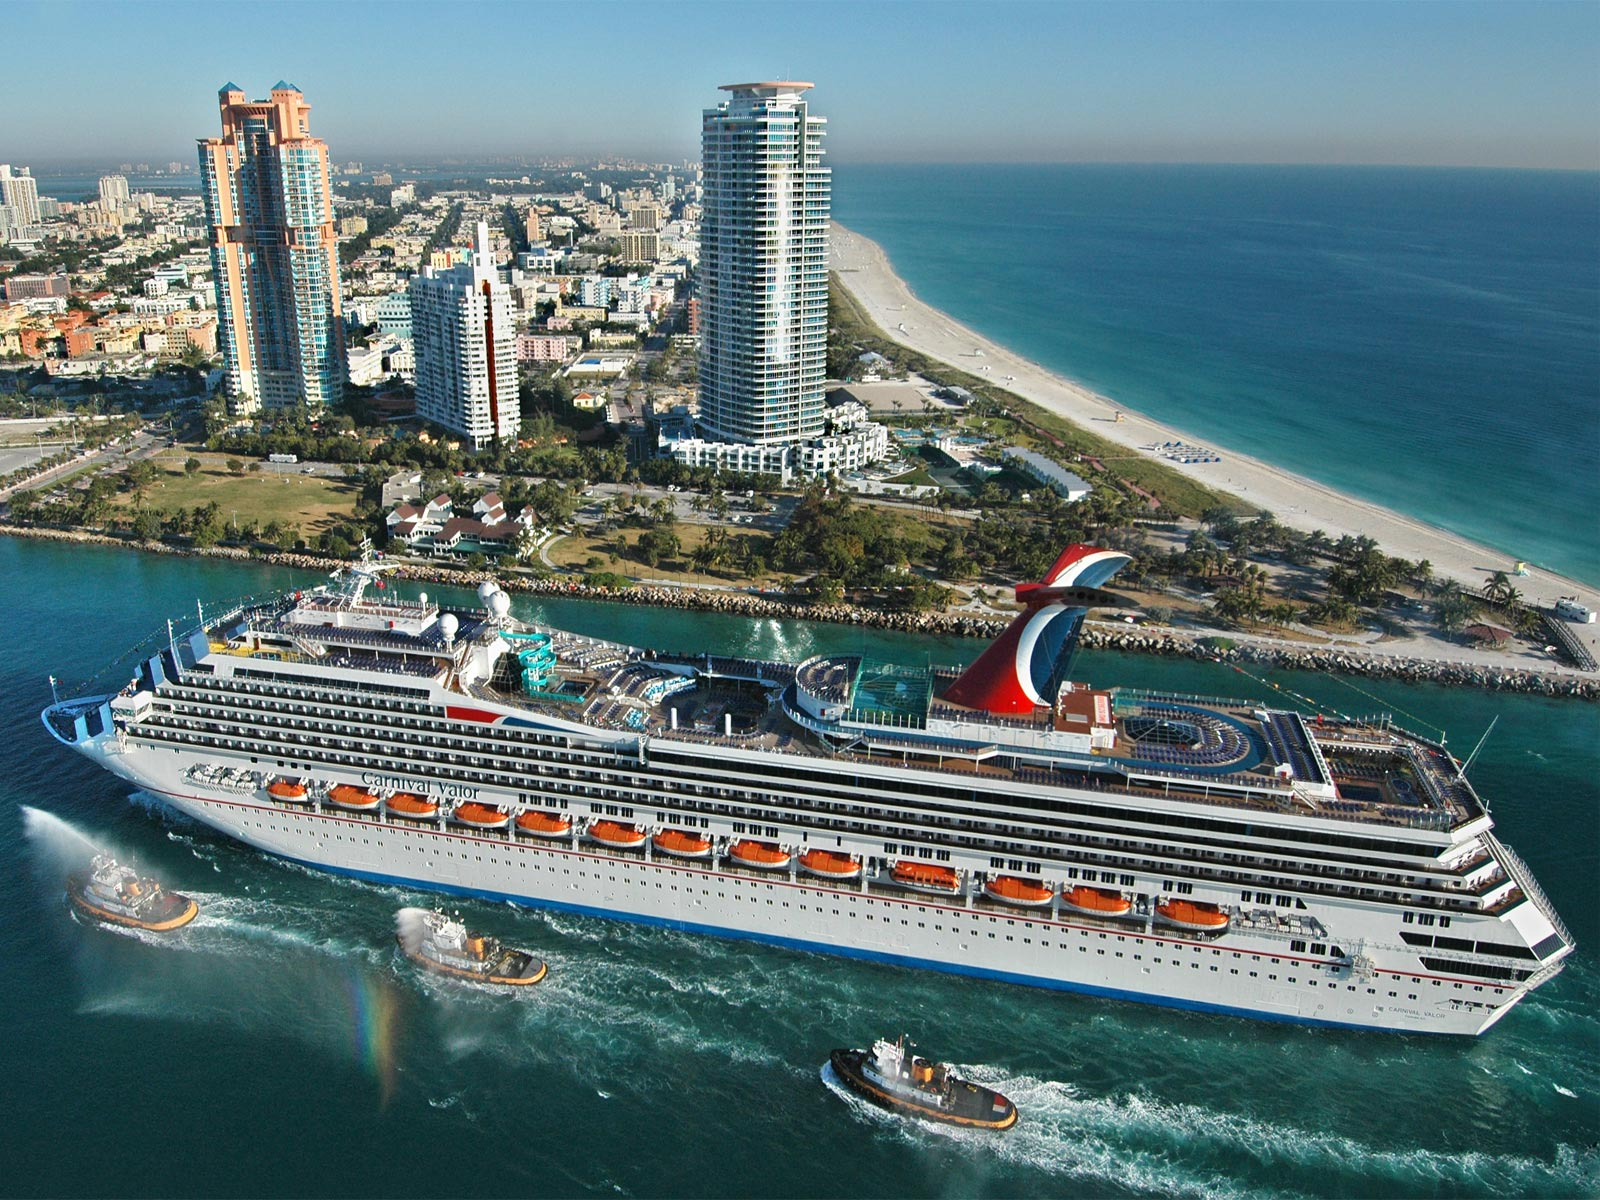 Carnival Valor Reviews Carnival Cruise Lines Reviews Cruisemates 1600x1200